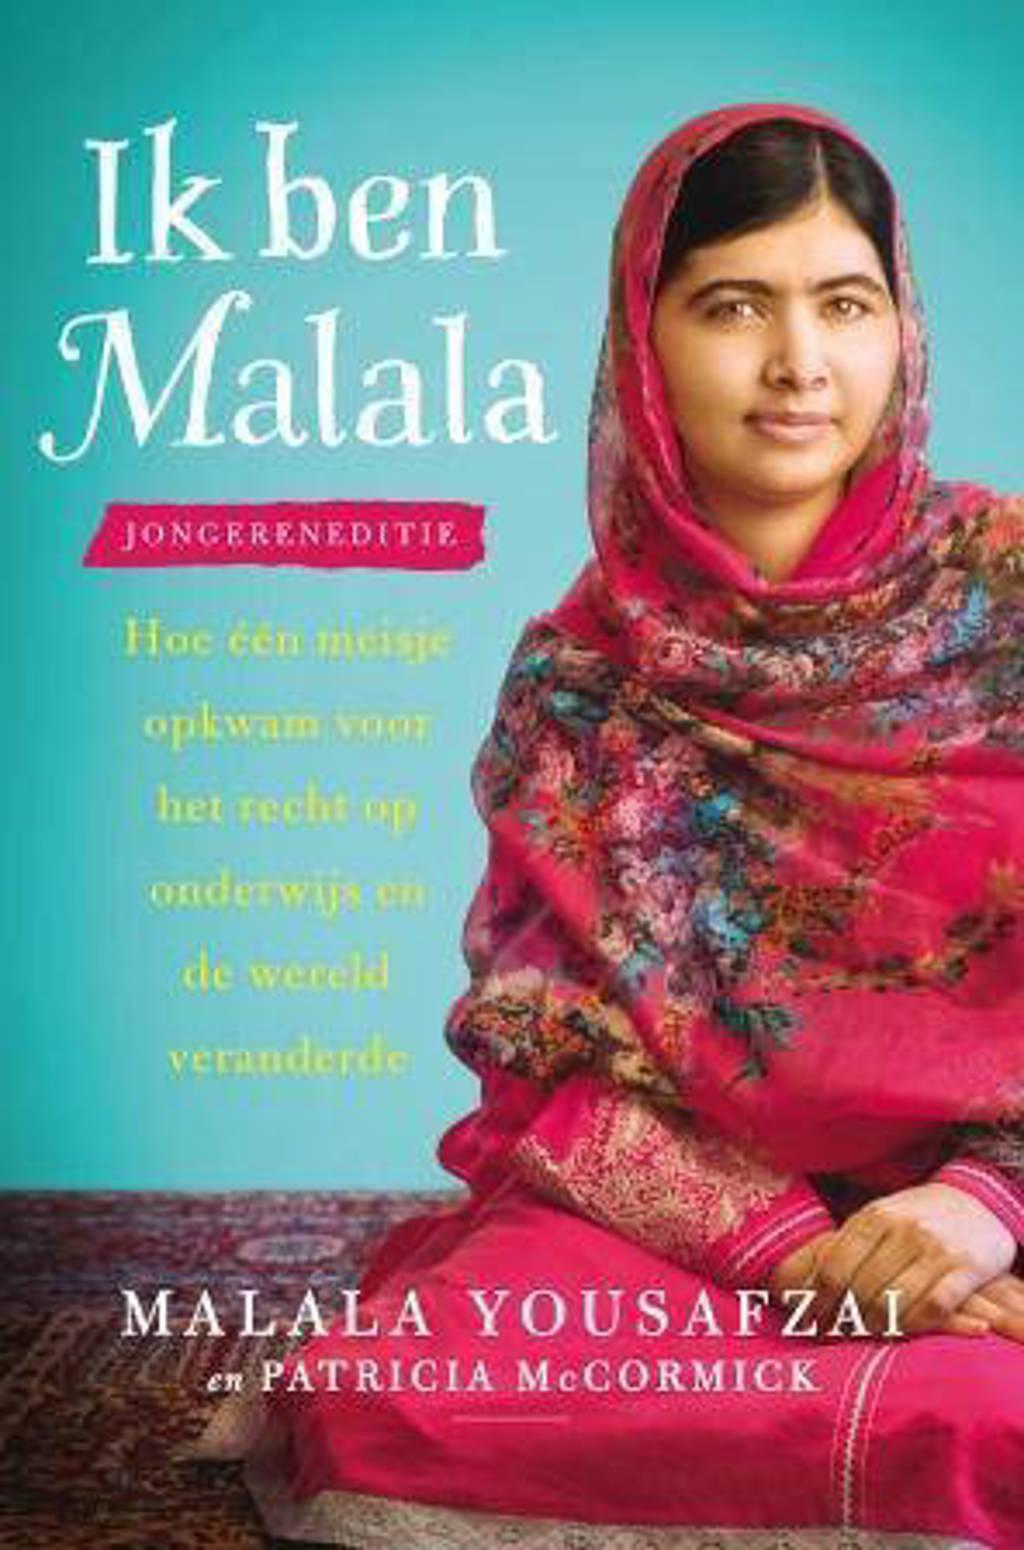 Ik ben Malala - Malala Yousafzai en Patricia McCormick